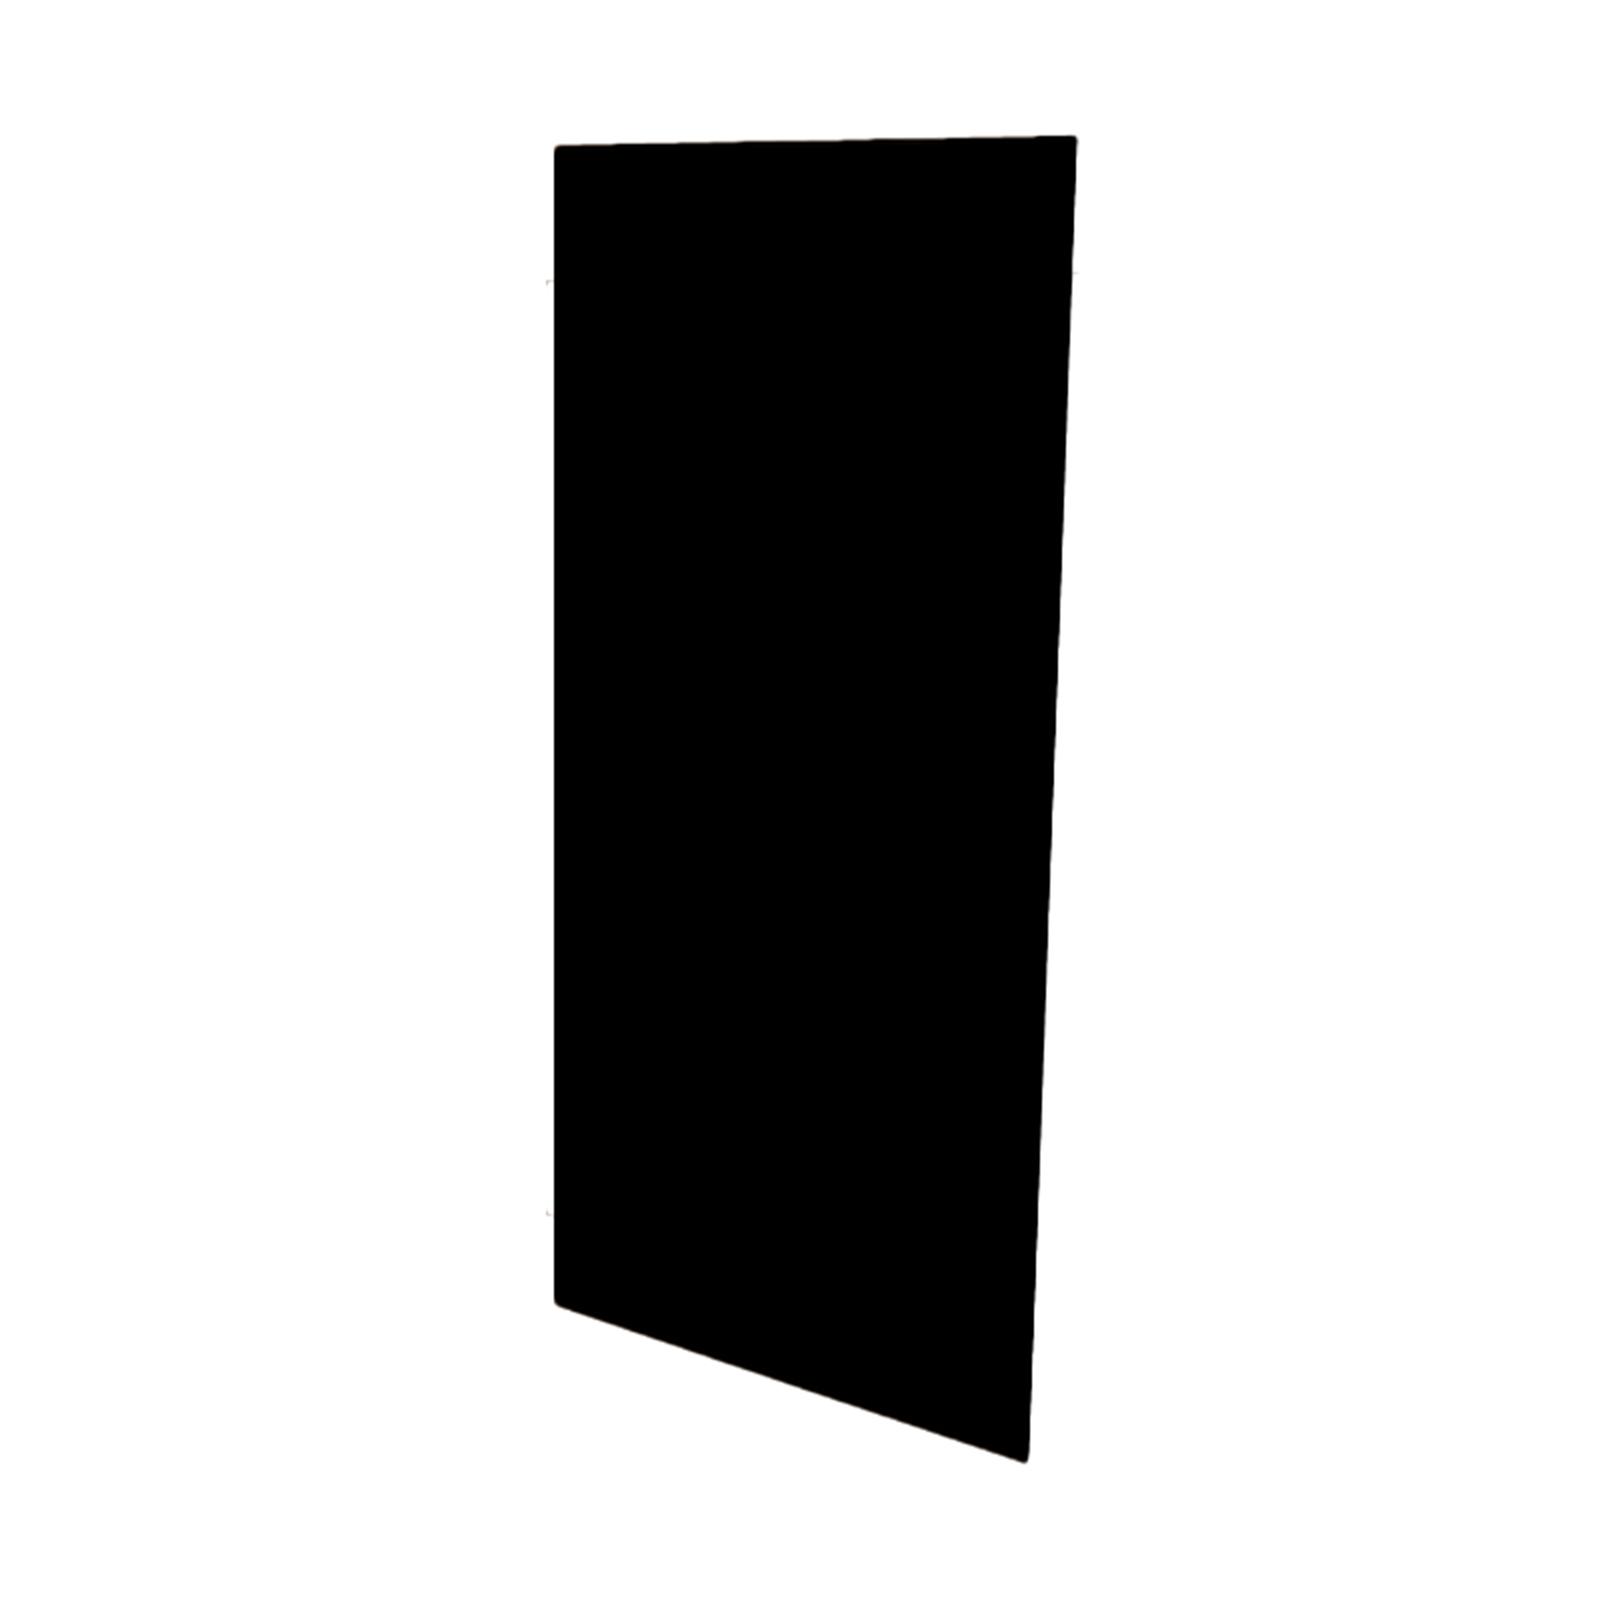 Vistelle 2440 x 1000 x 4mm Eclipse High Gloss Acrylic Bathroom Panel